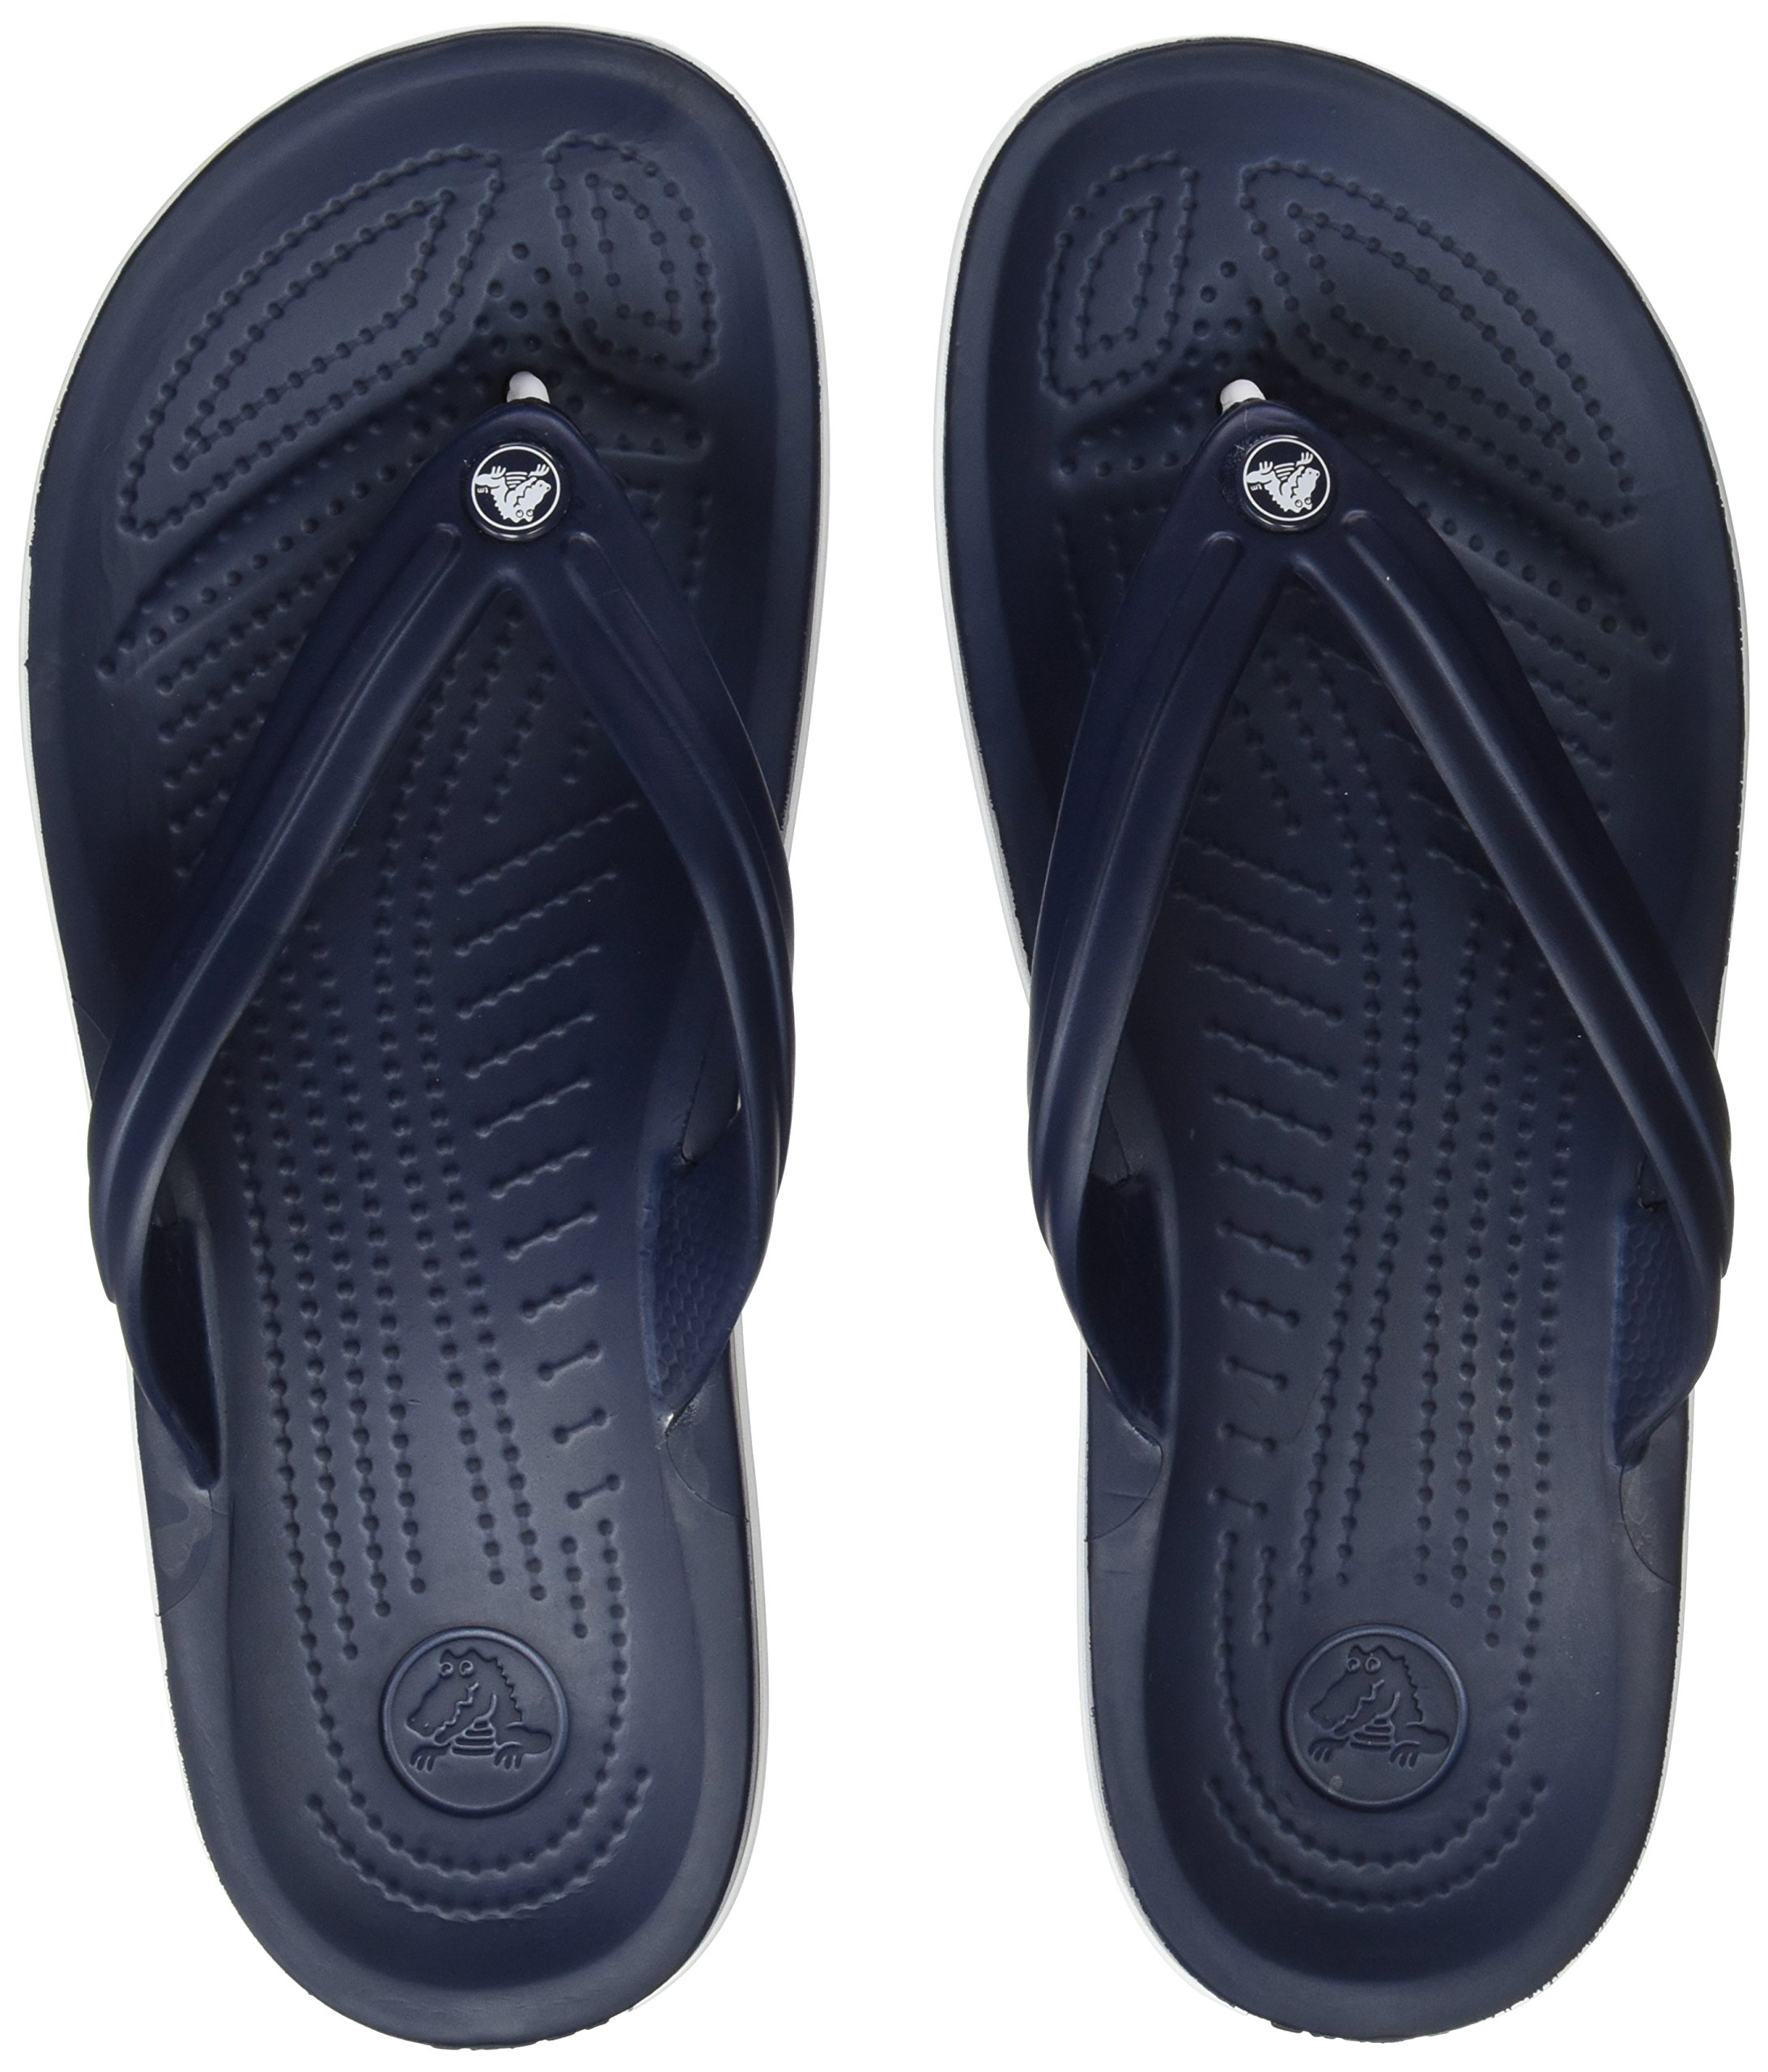 Crocs Unisex Crocband Flip-Flop, Navy, 9 US Men / 11 US Women